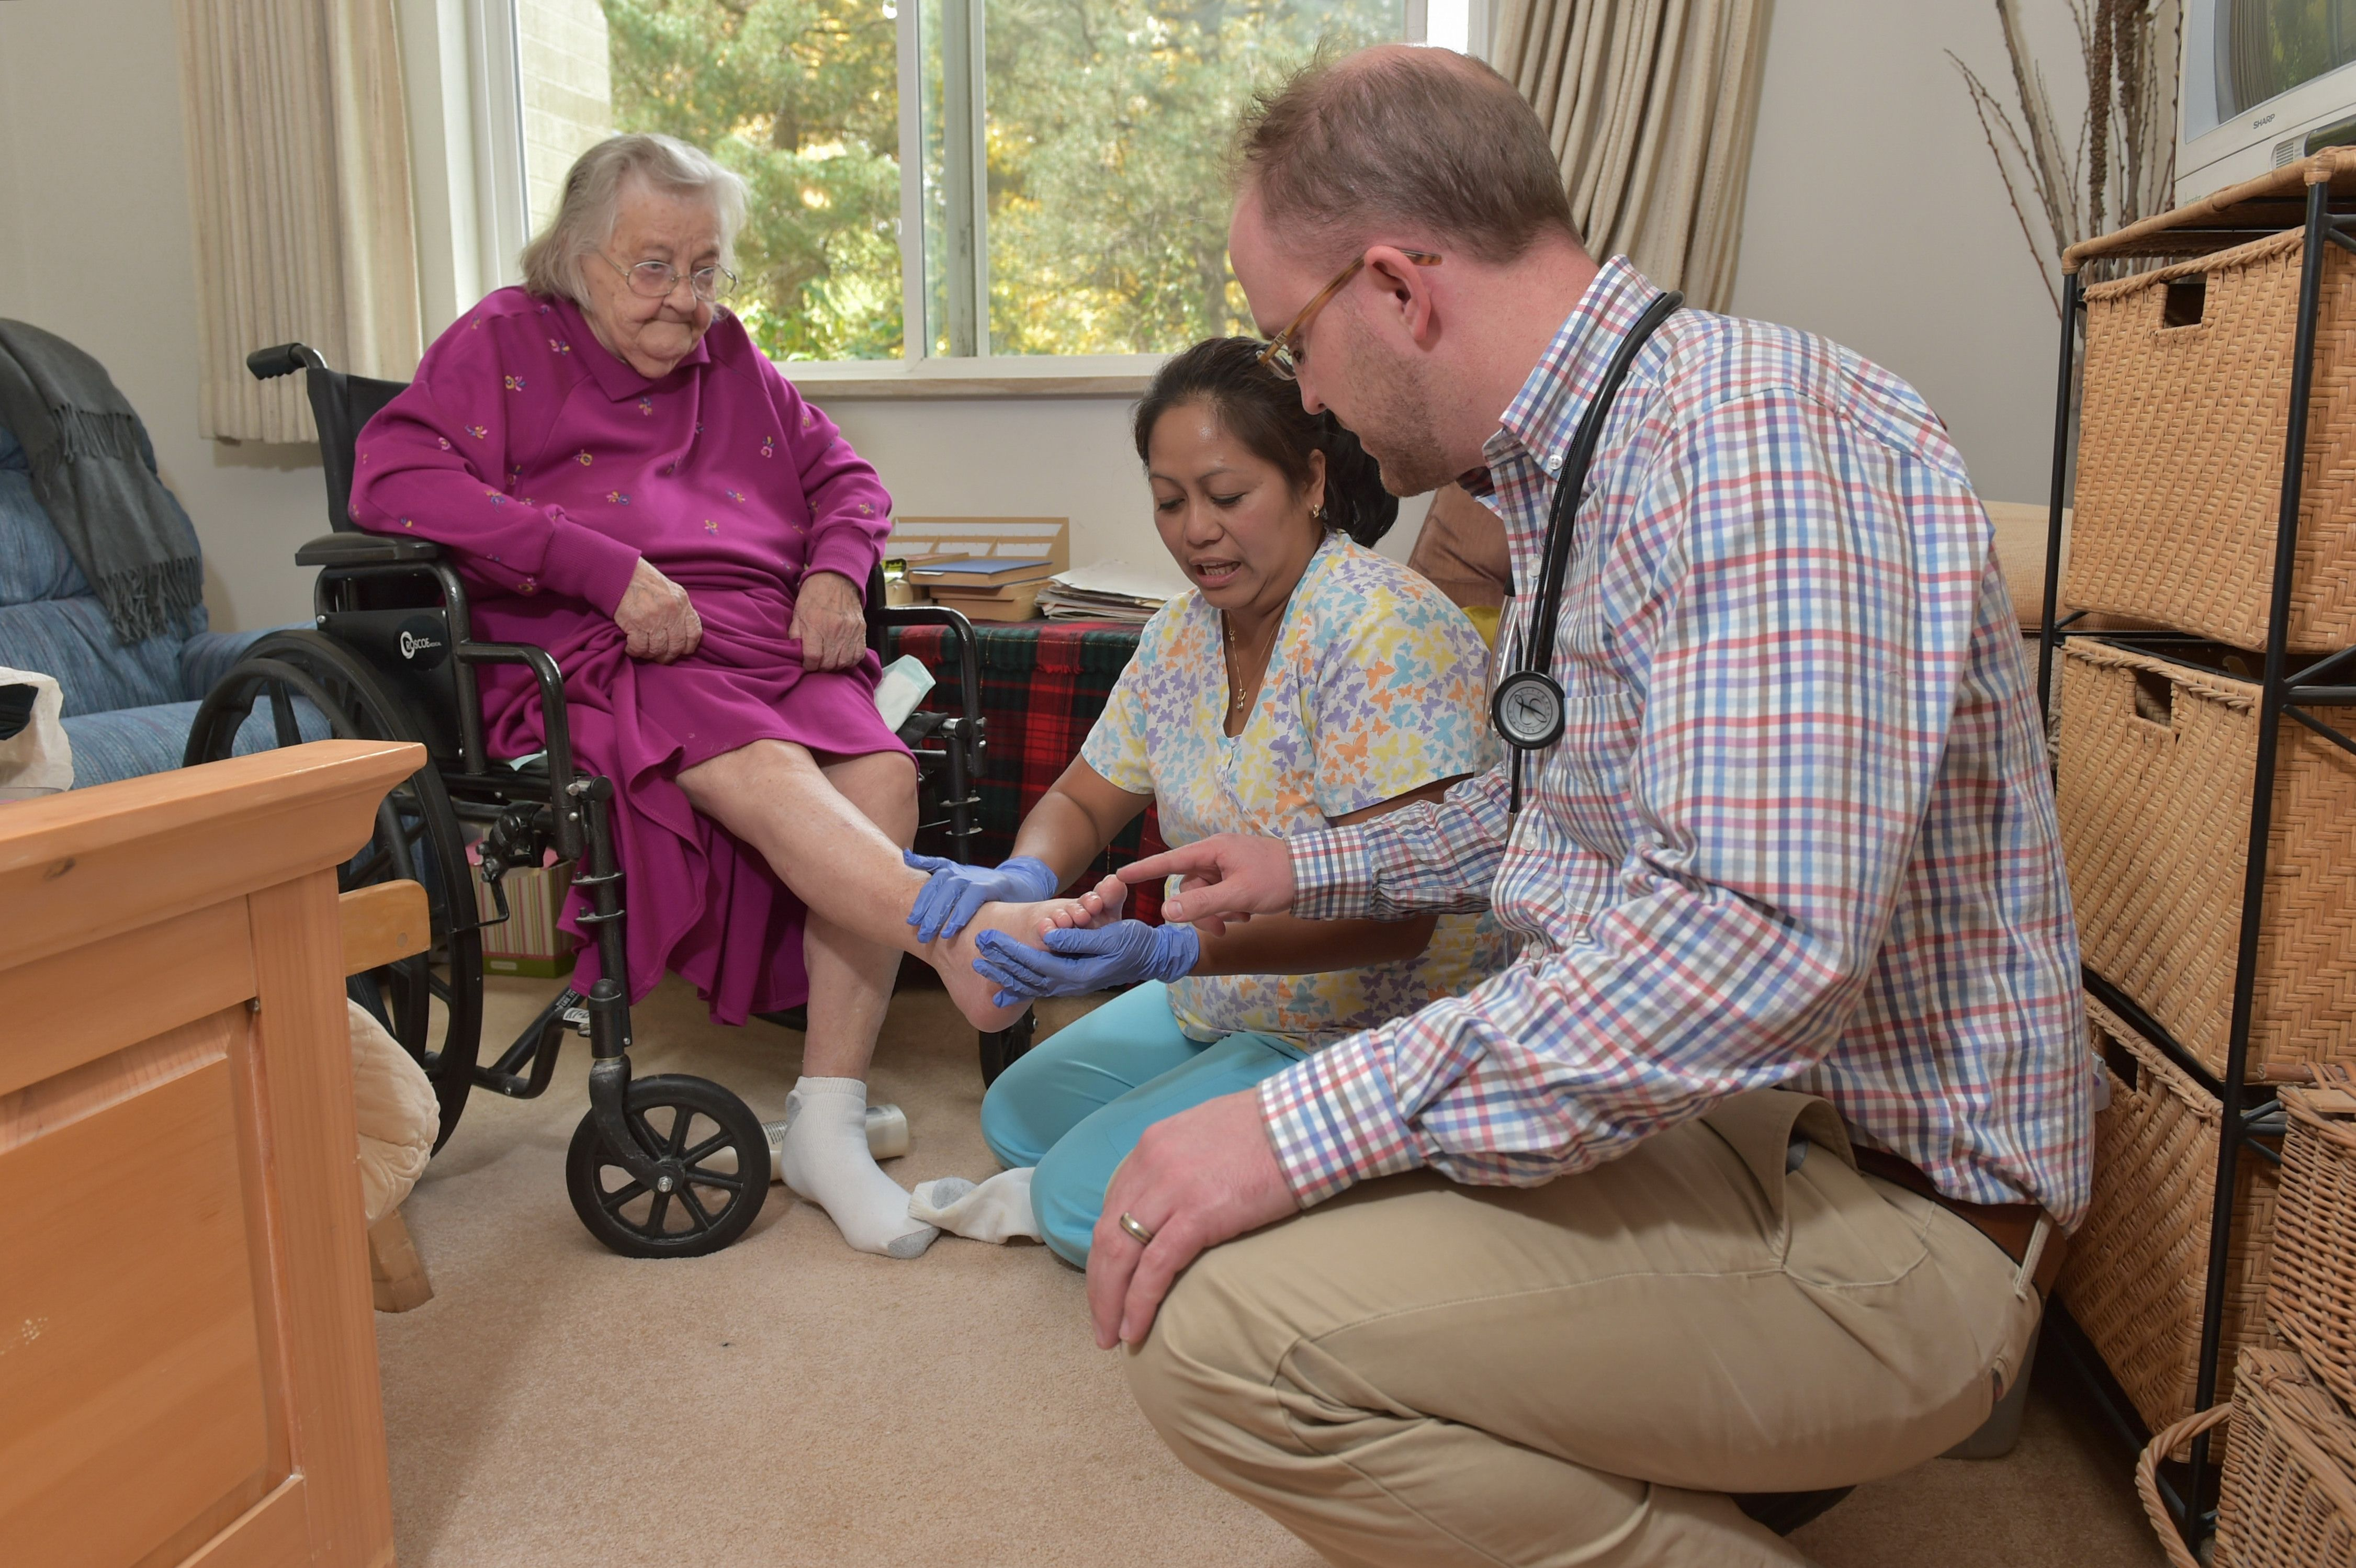 Tackling Patients' Needs